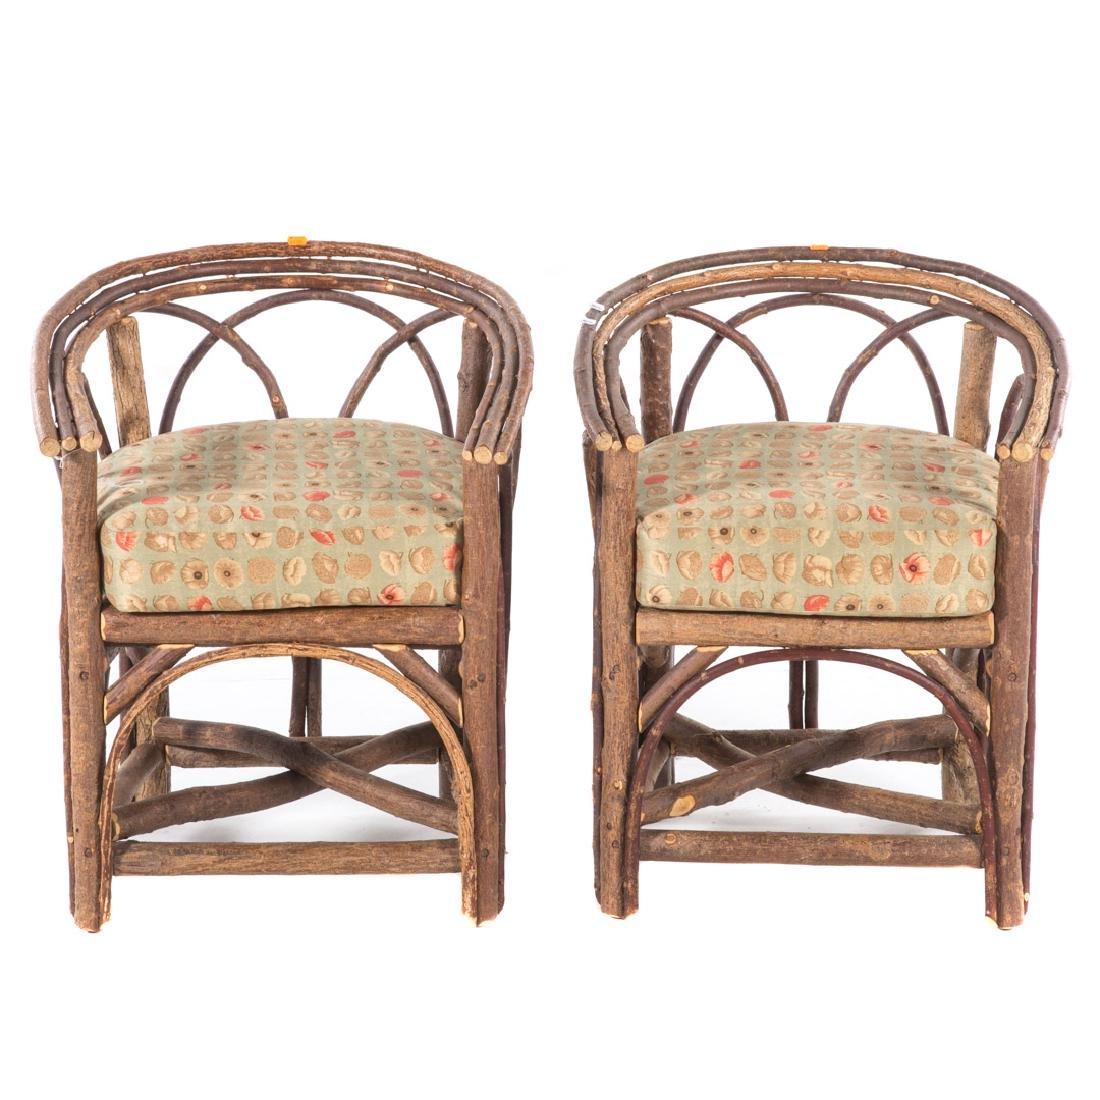 Pair Adirondack style bent twig arm chairs,